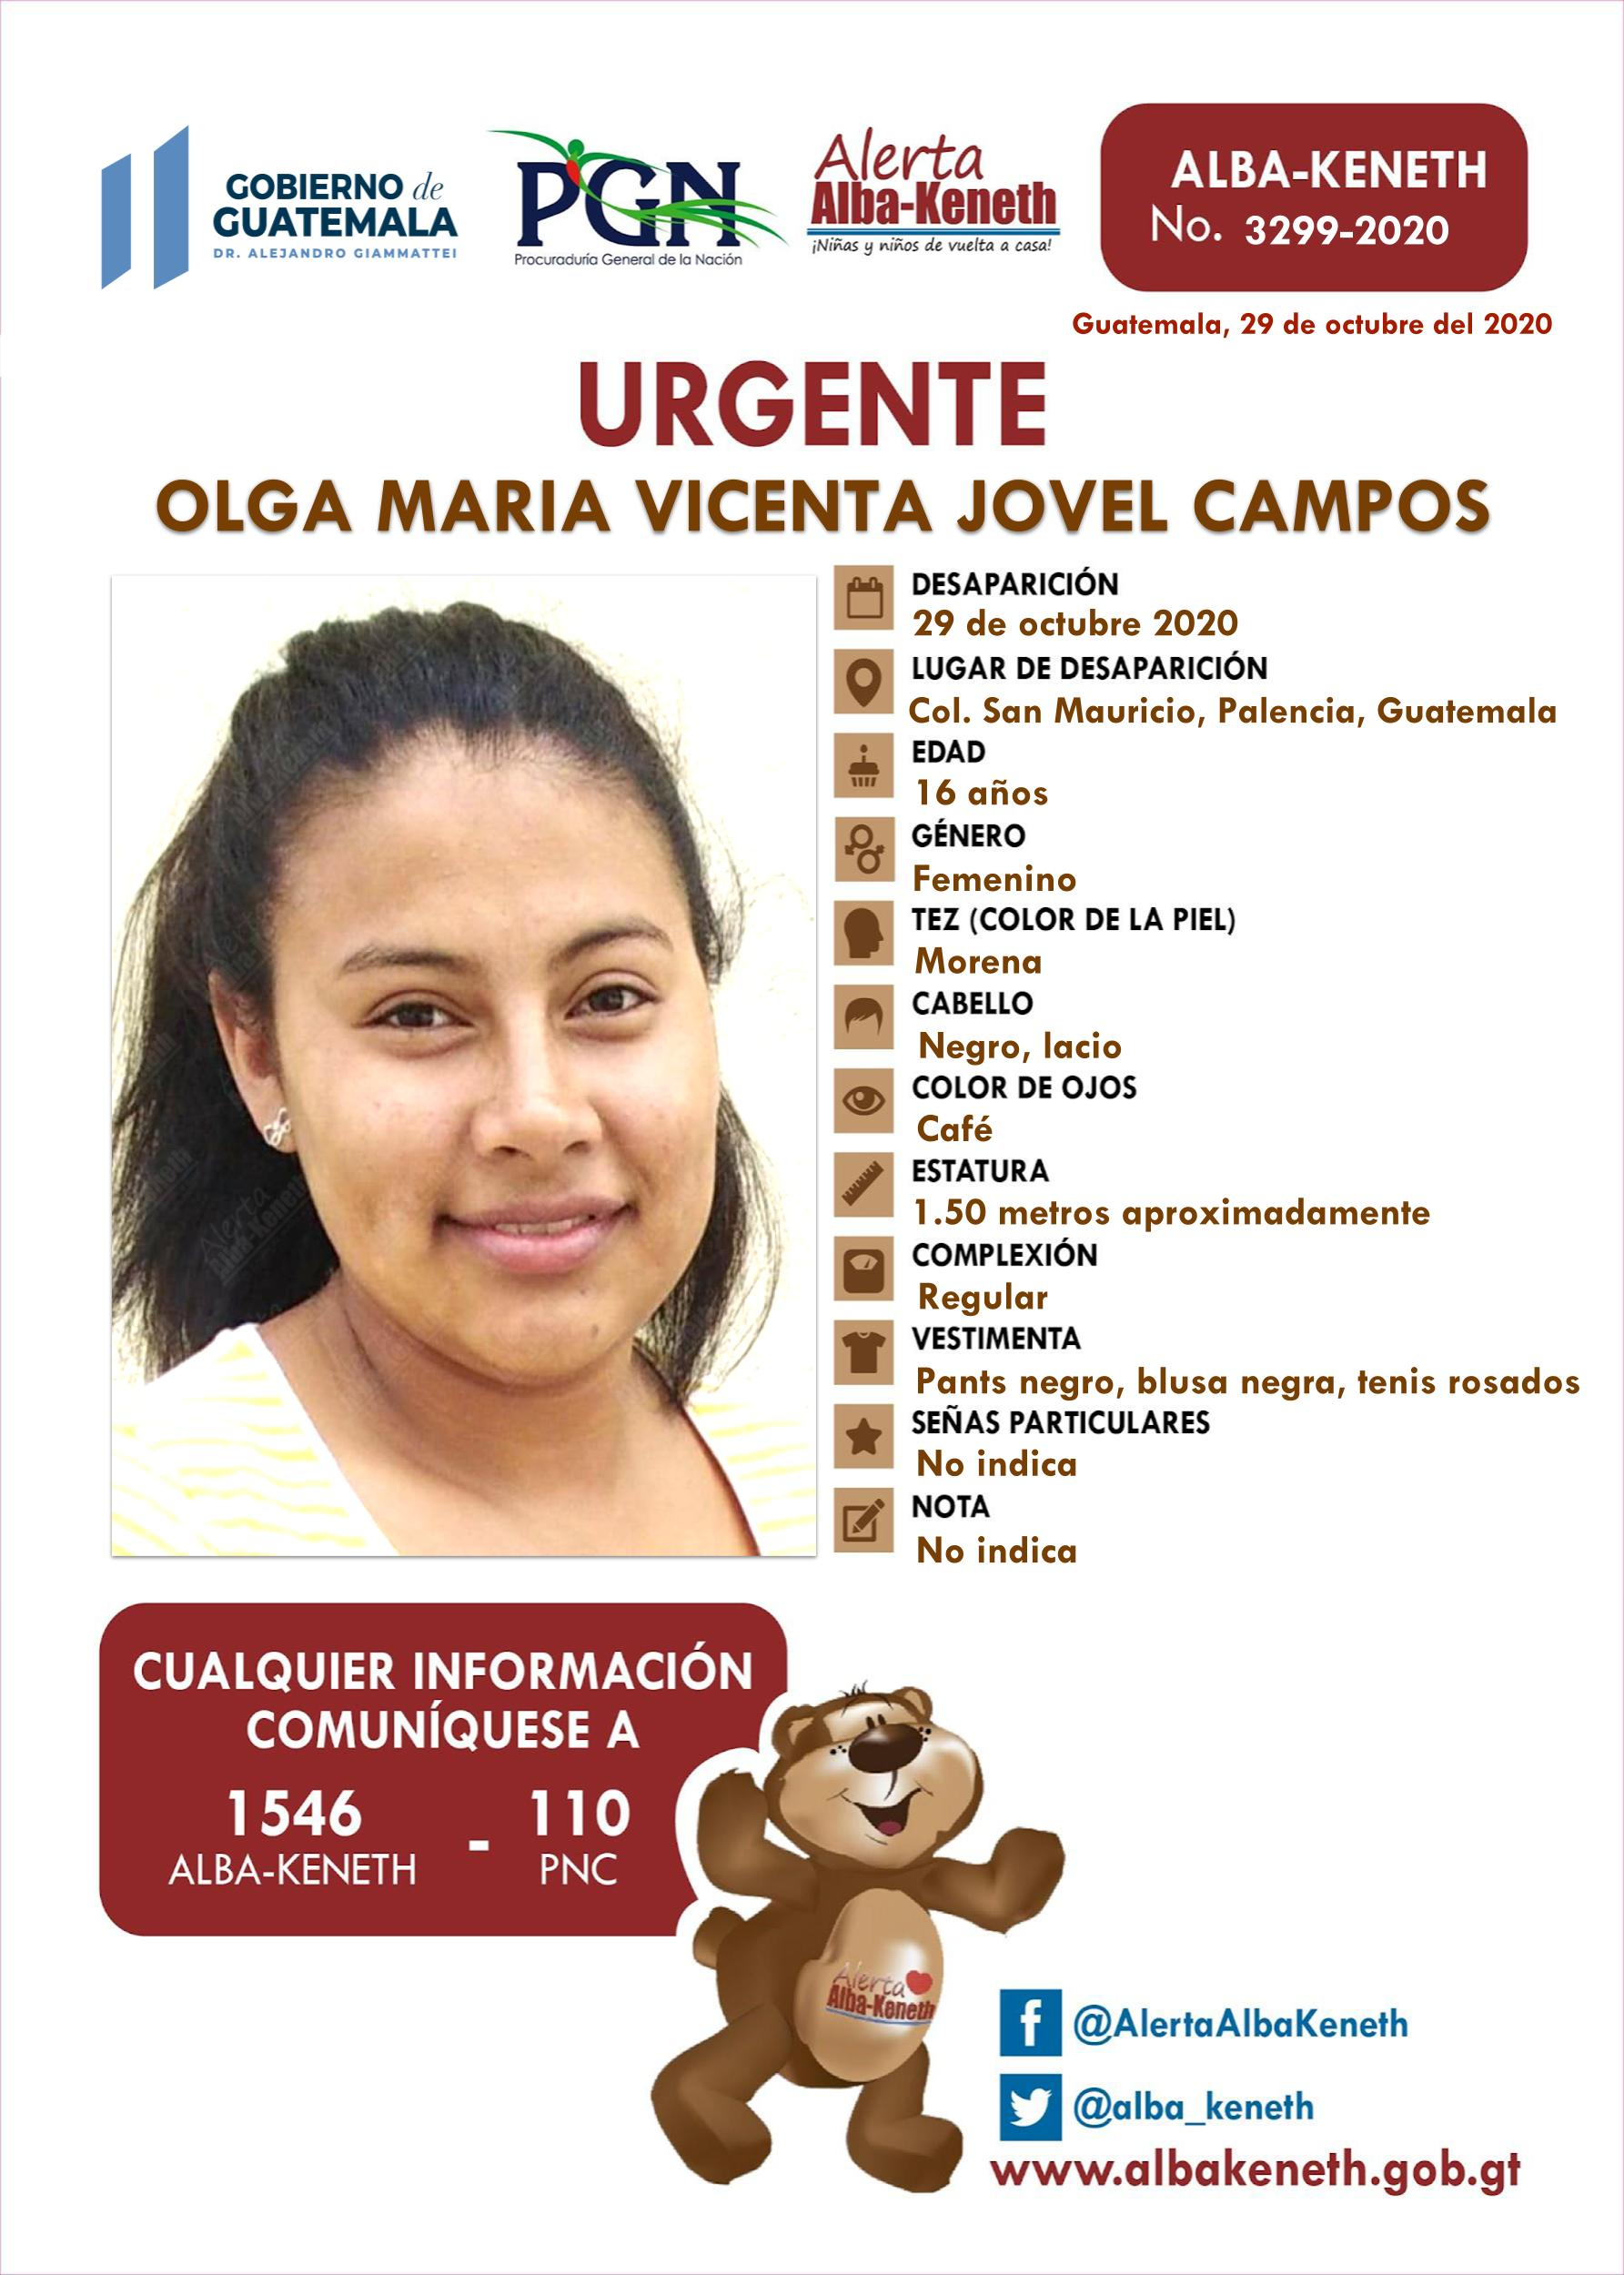 Olga Maria Vicenta Jovel Campos